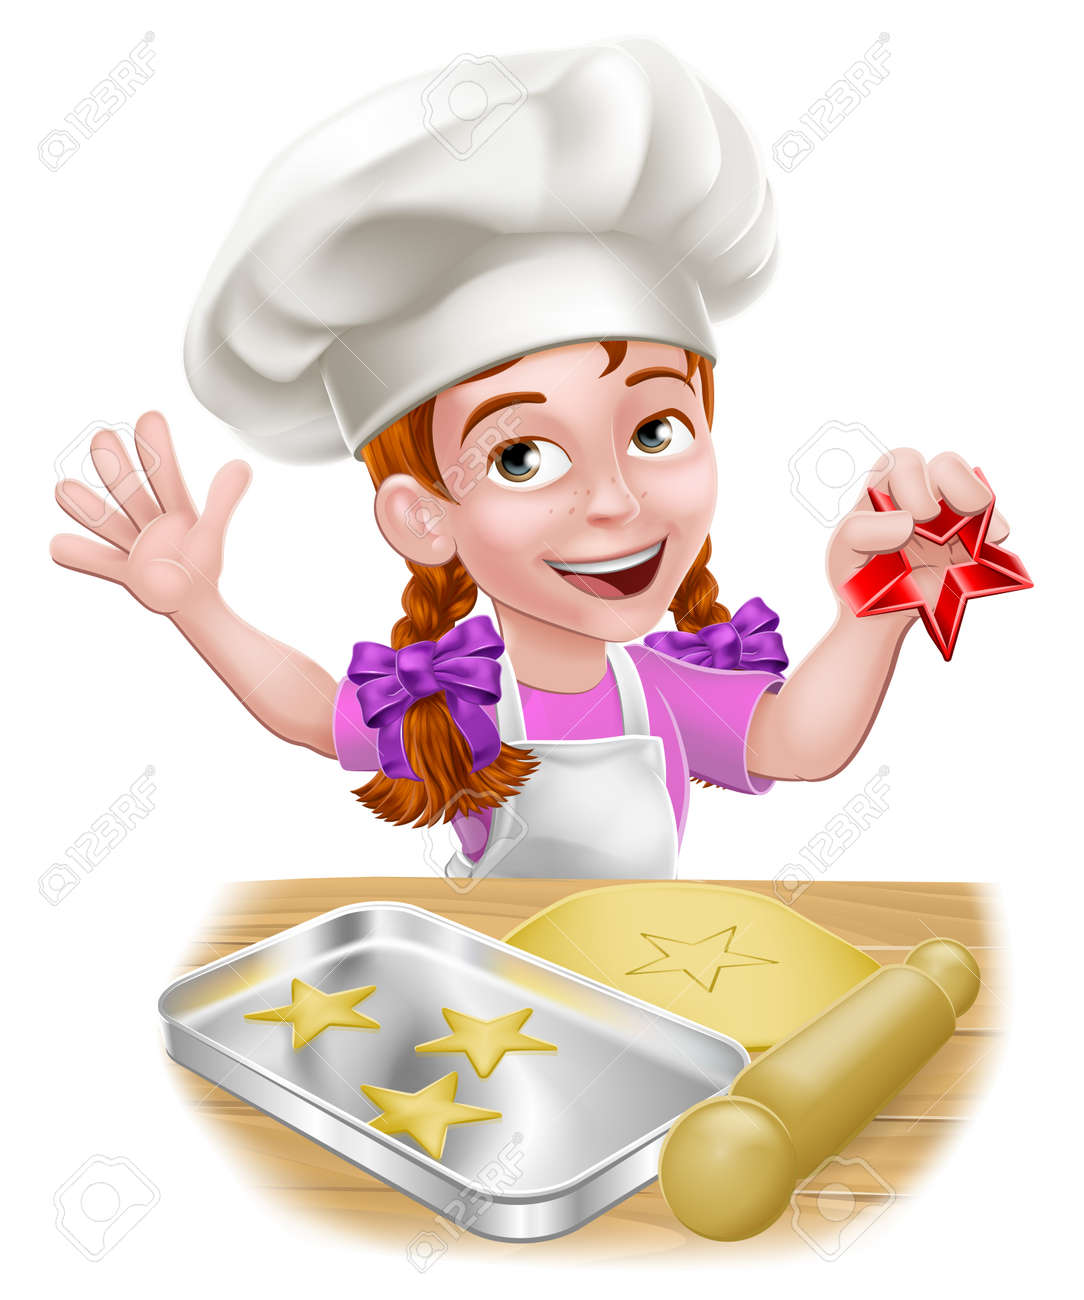 Girl Child Chef Kid Cartoon Character Baking - 135314147